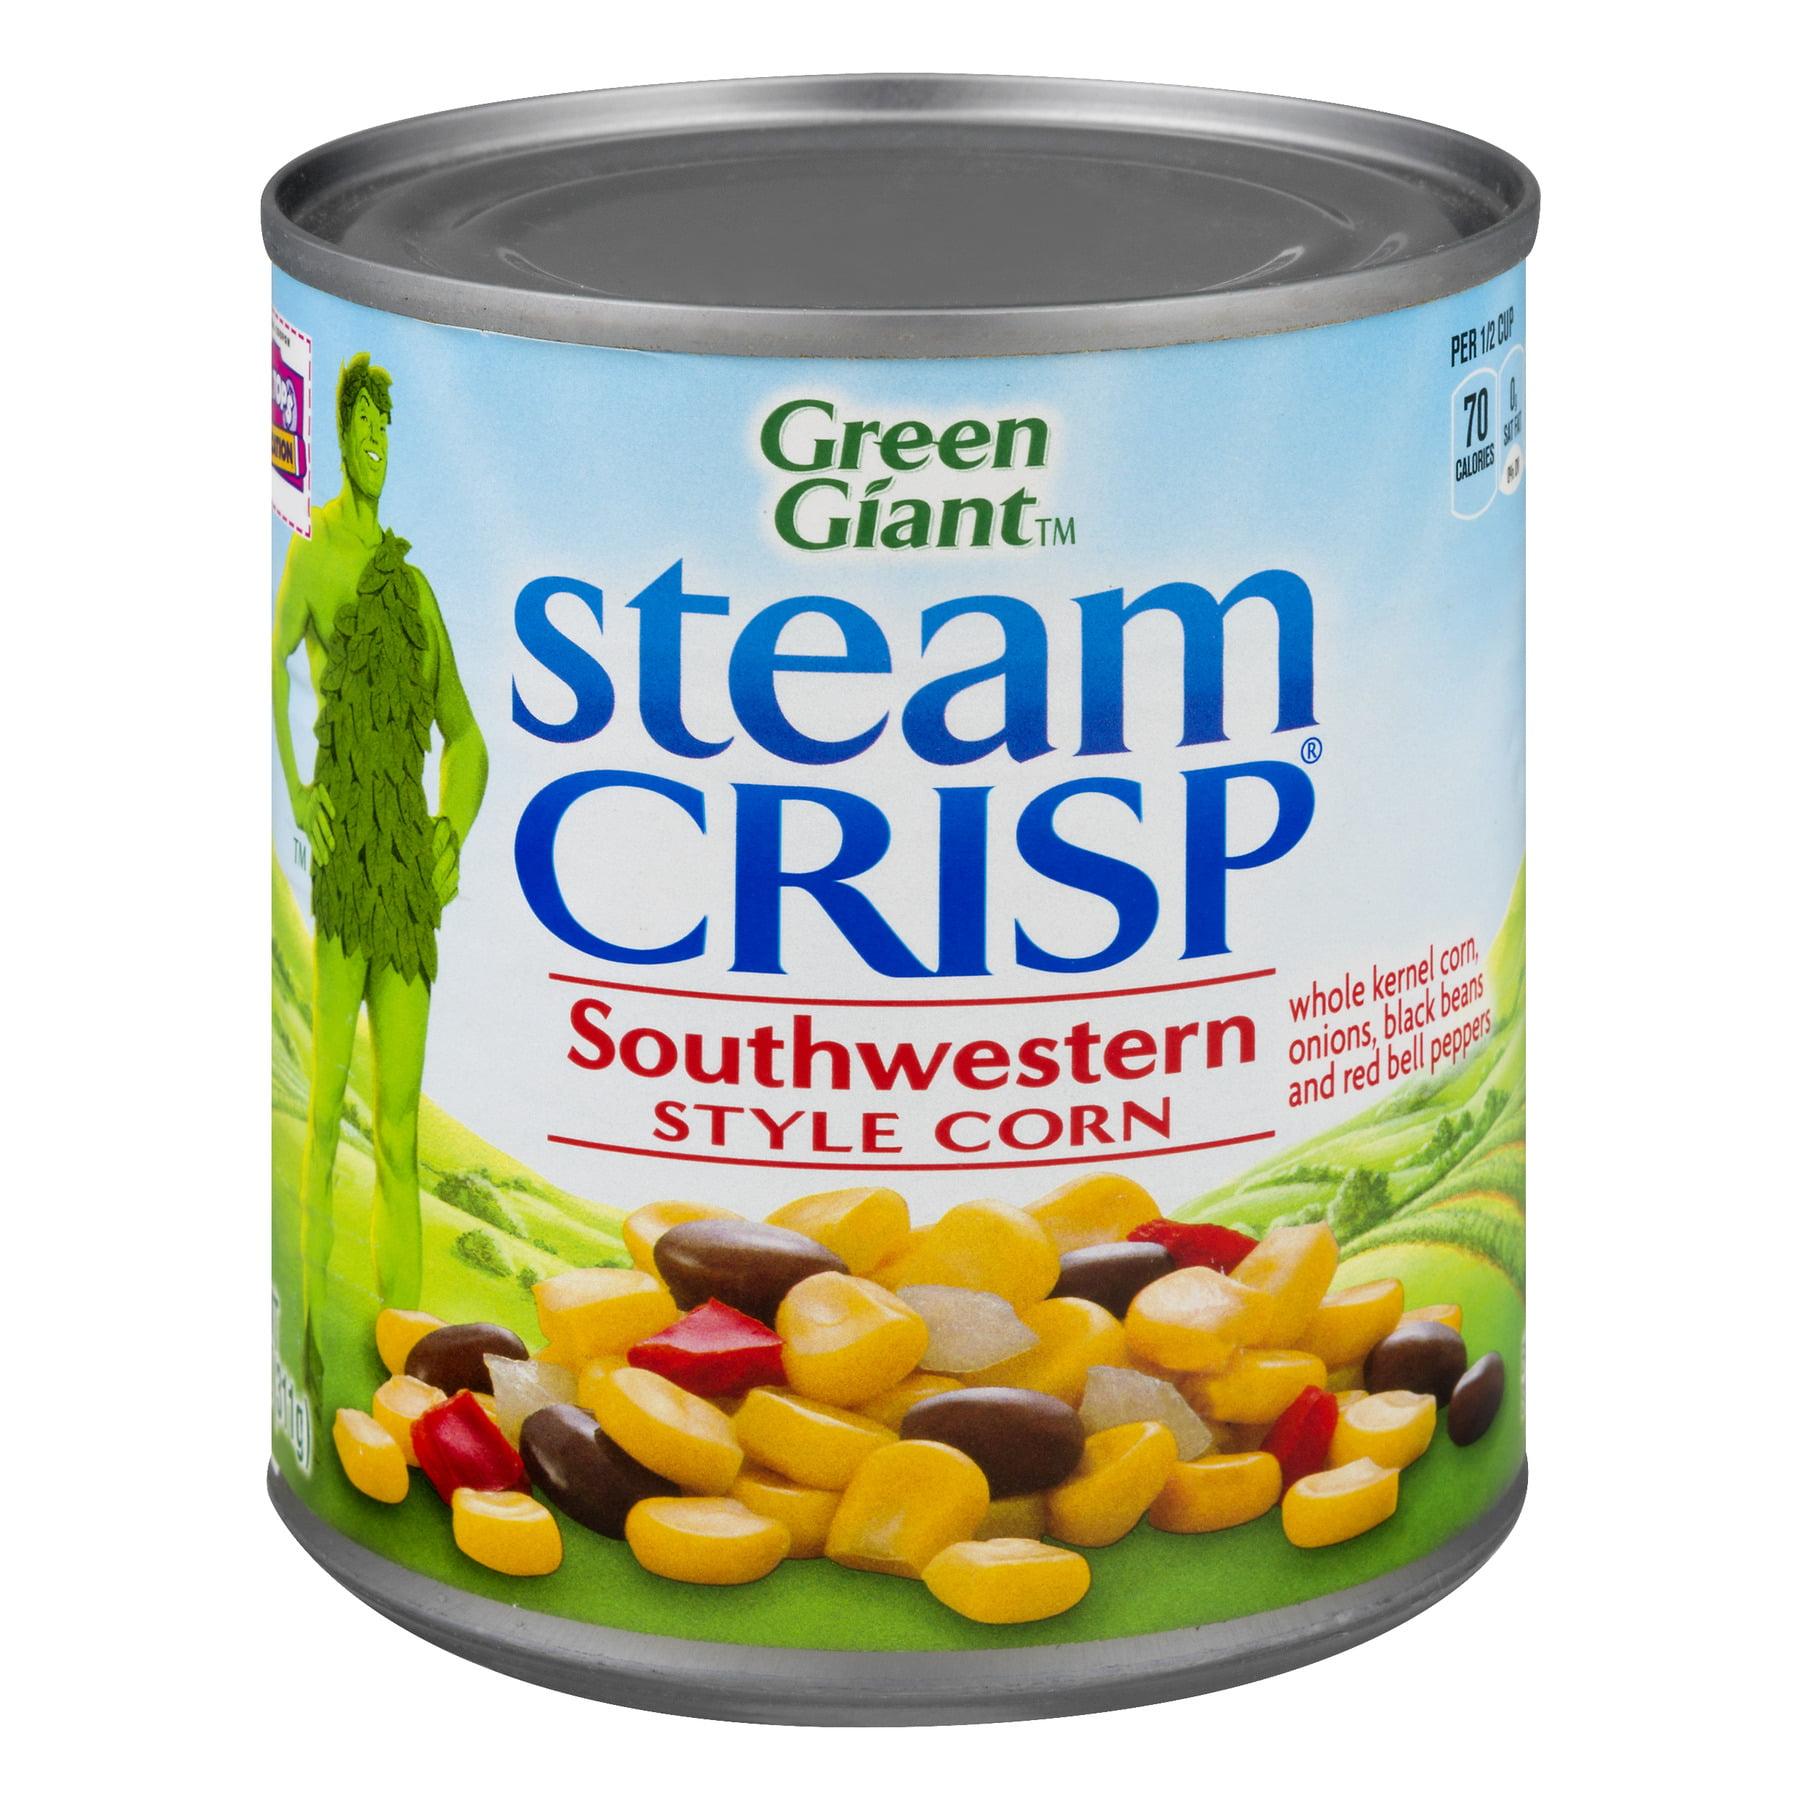 Green Giant Steamcrisp Southwestern Style Corn, 11 Oz